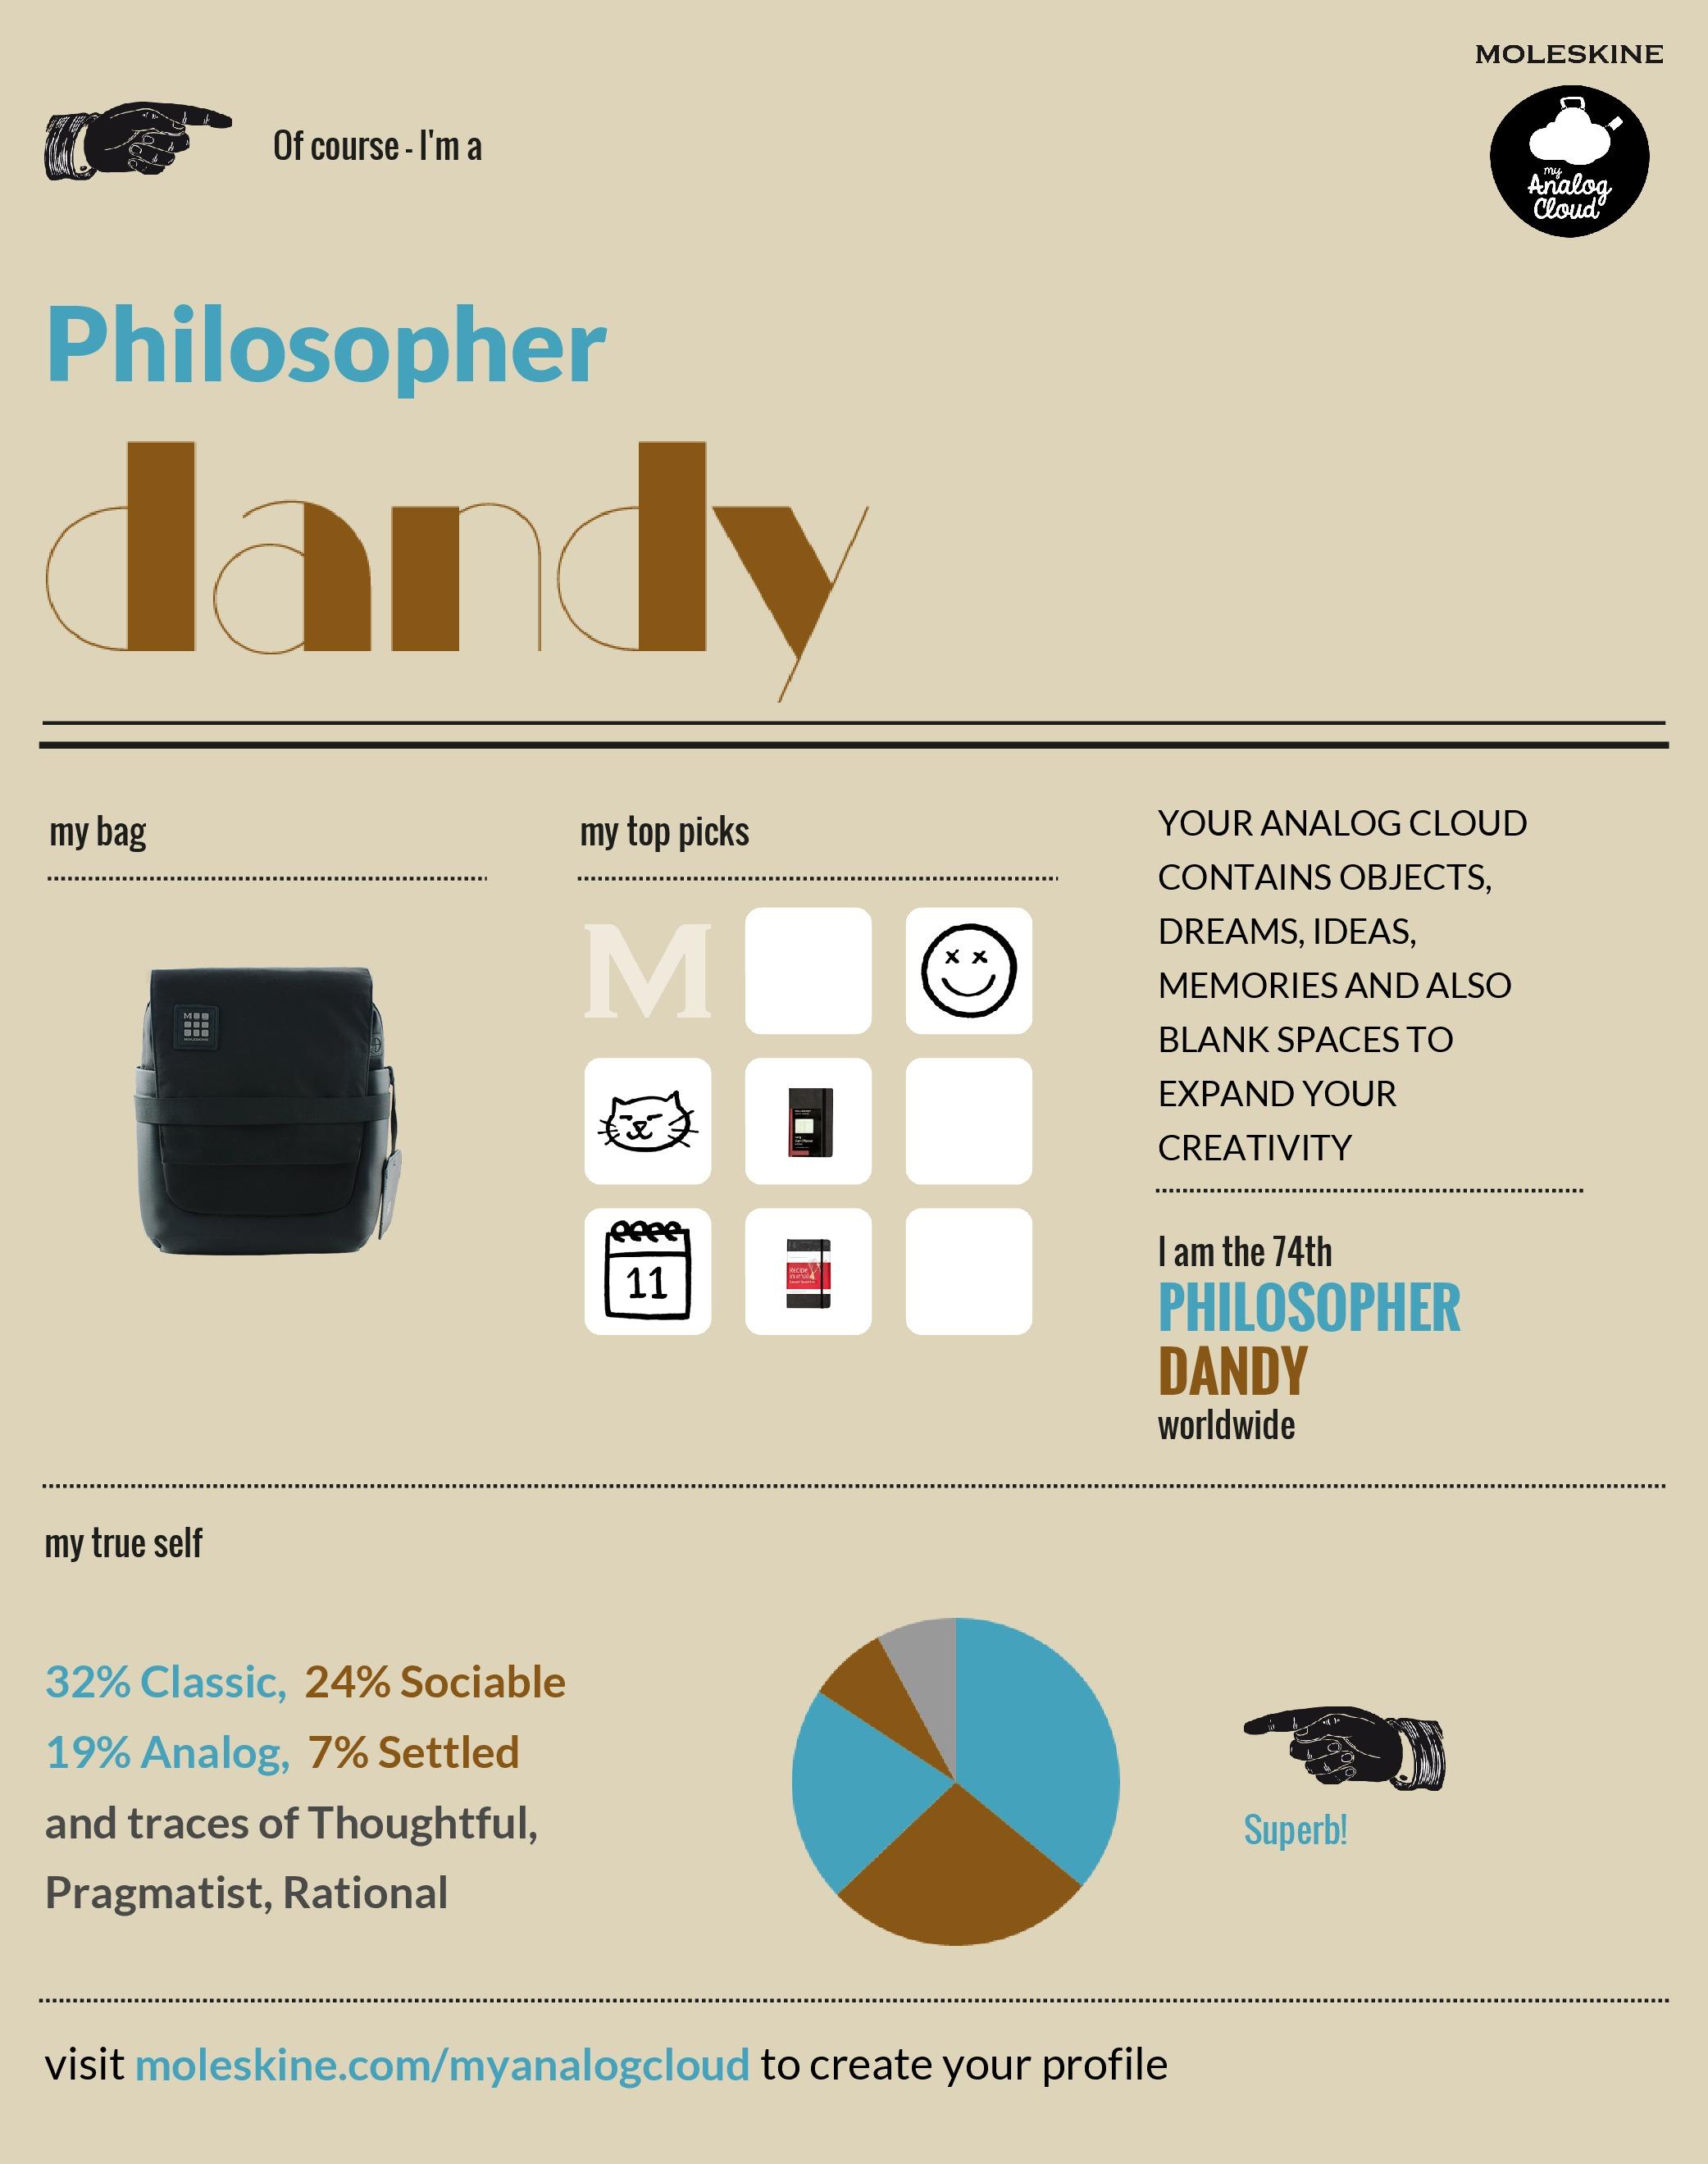 Philosopher Dandy